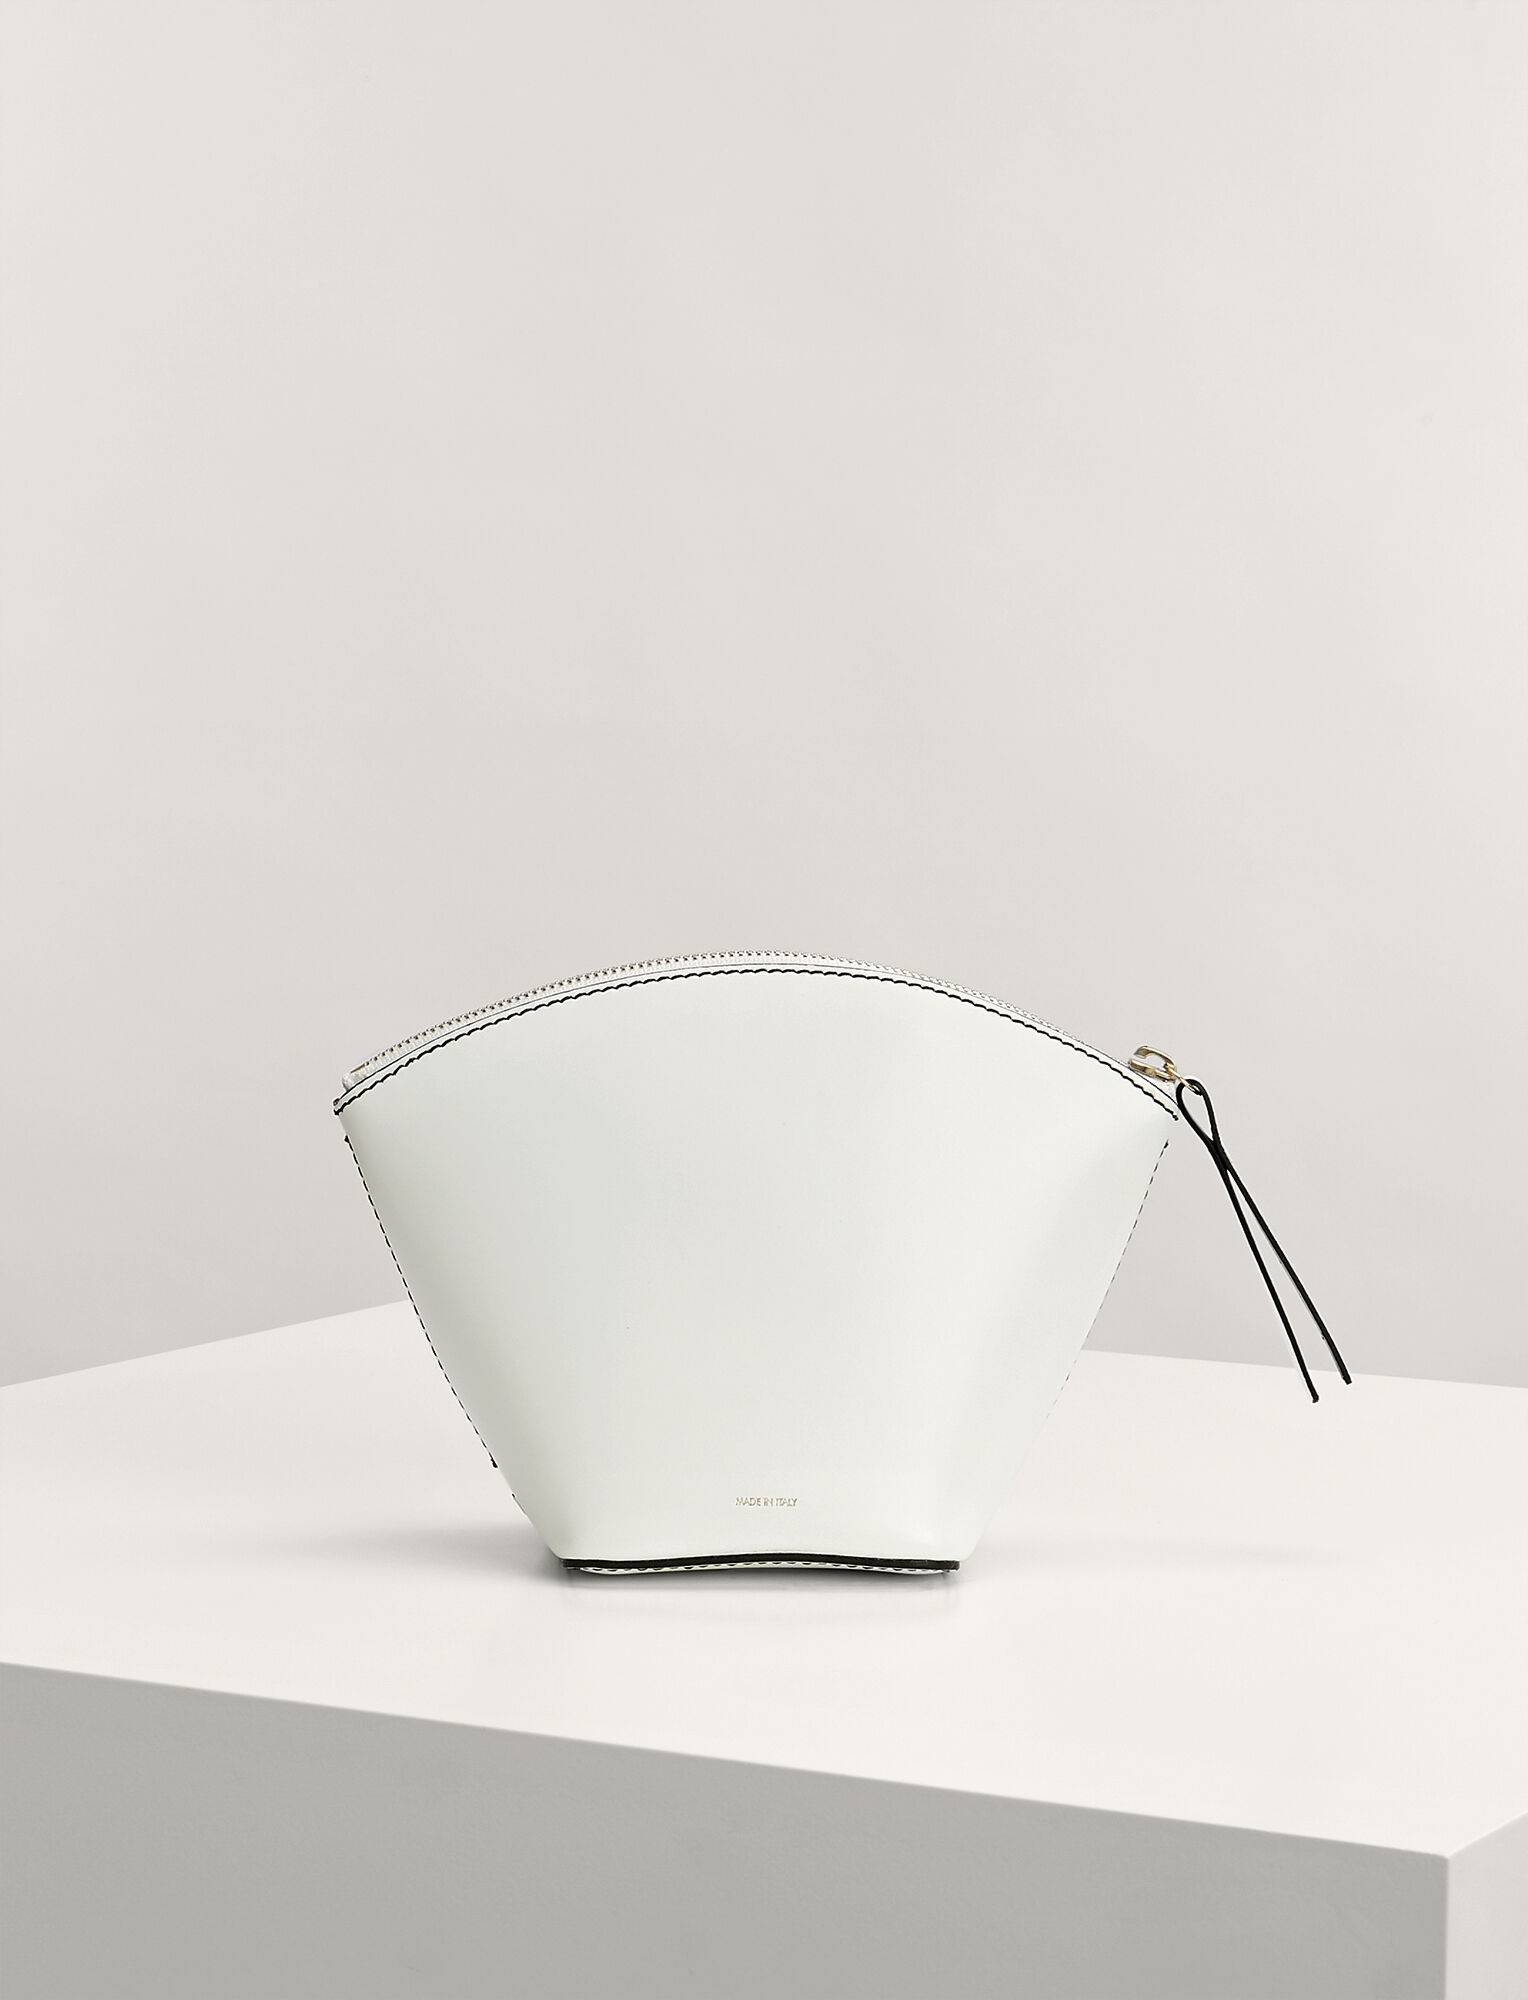 Joseph, Calf Leather Cosmetic Pouch, in WHITE